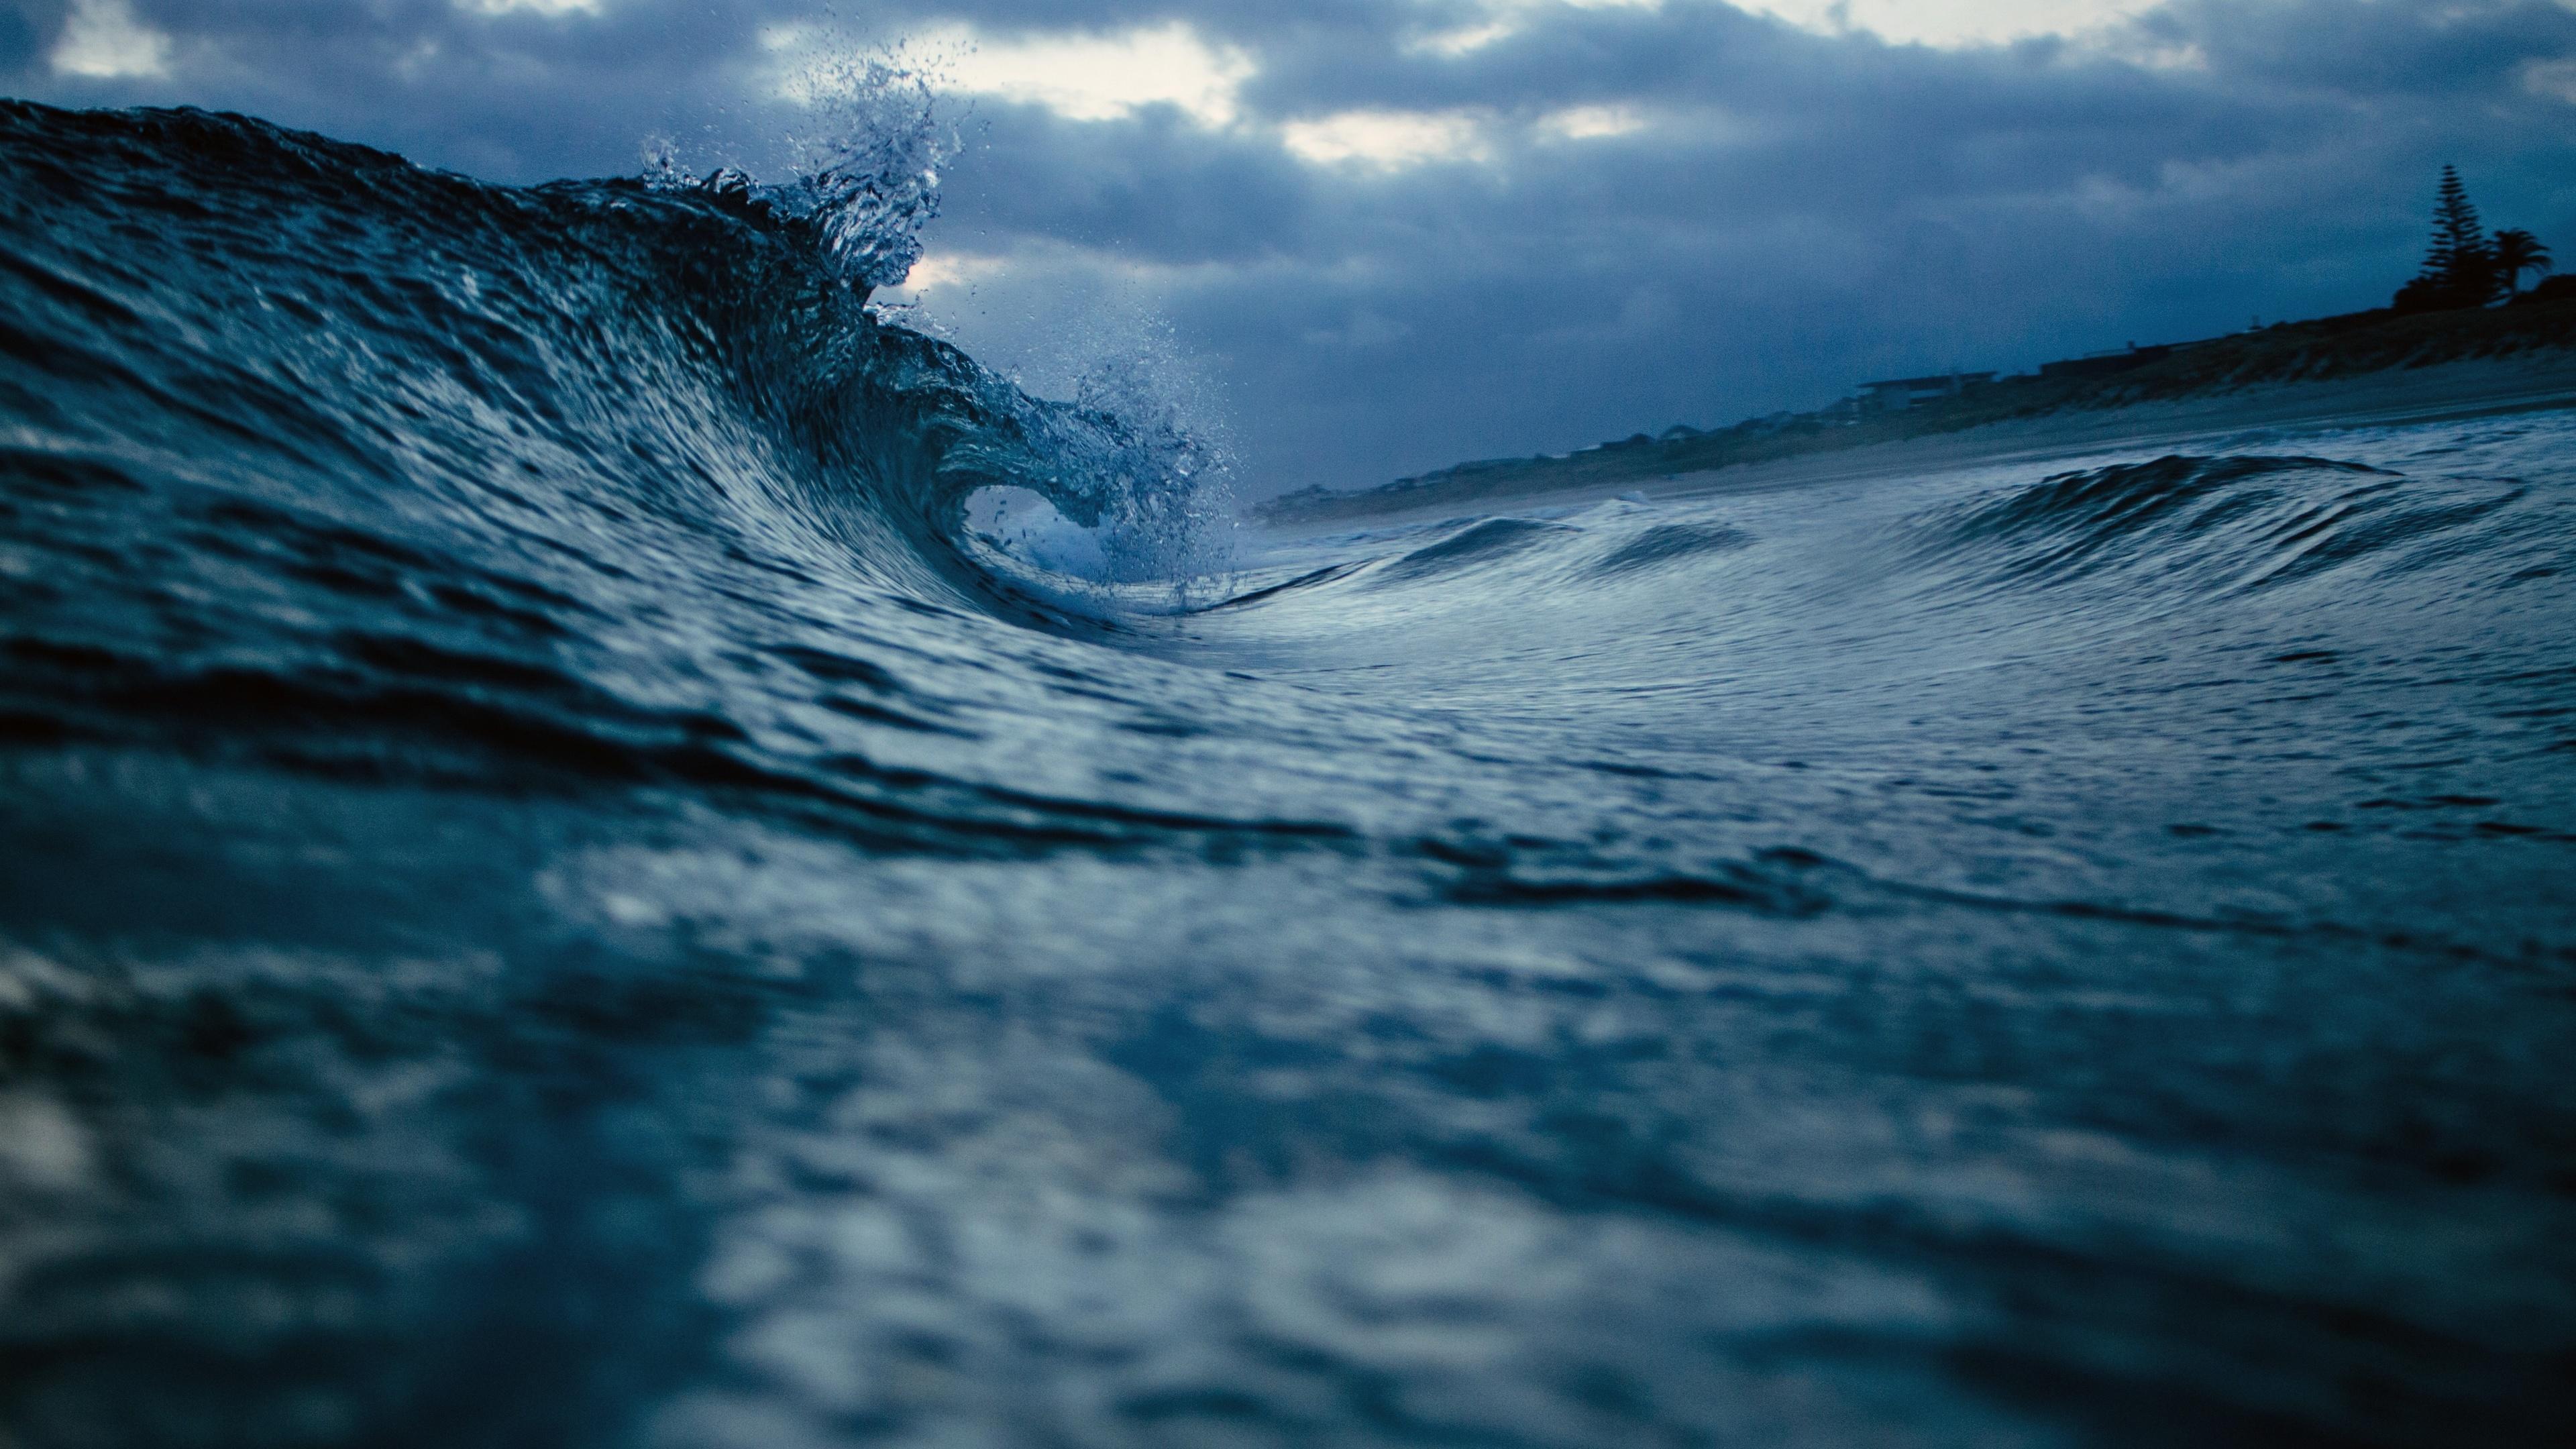 waves 4k 1540134911 - Waves 4k - waves wallpapers, nature wallpapers, hd-wallpapers, 5k wallpapers, 4k-wallpapers